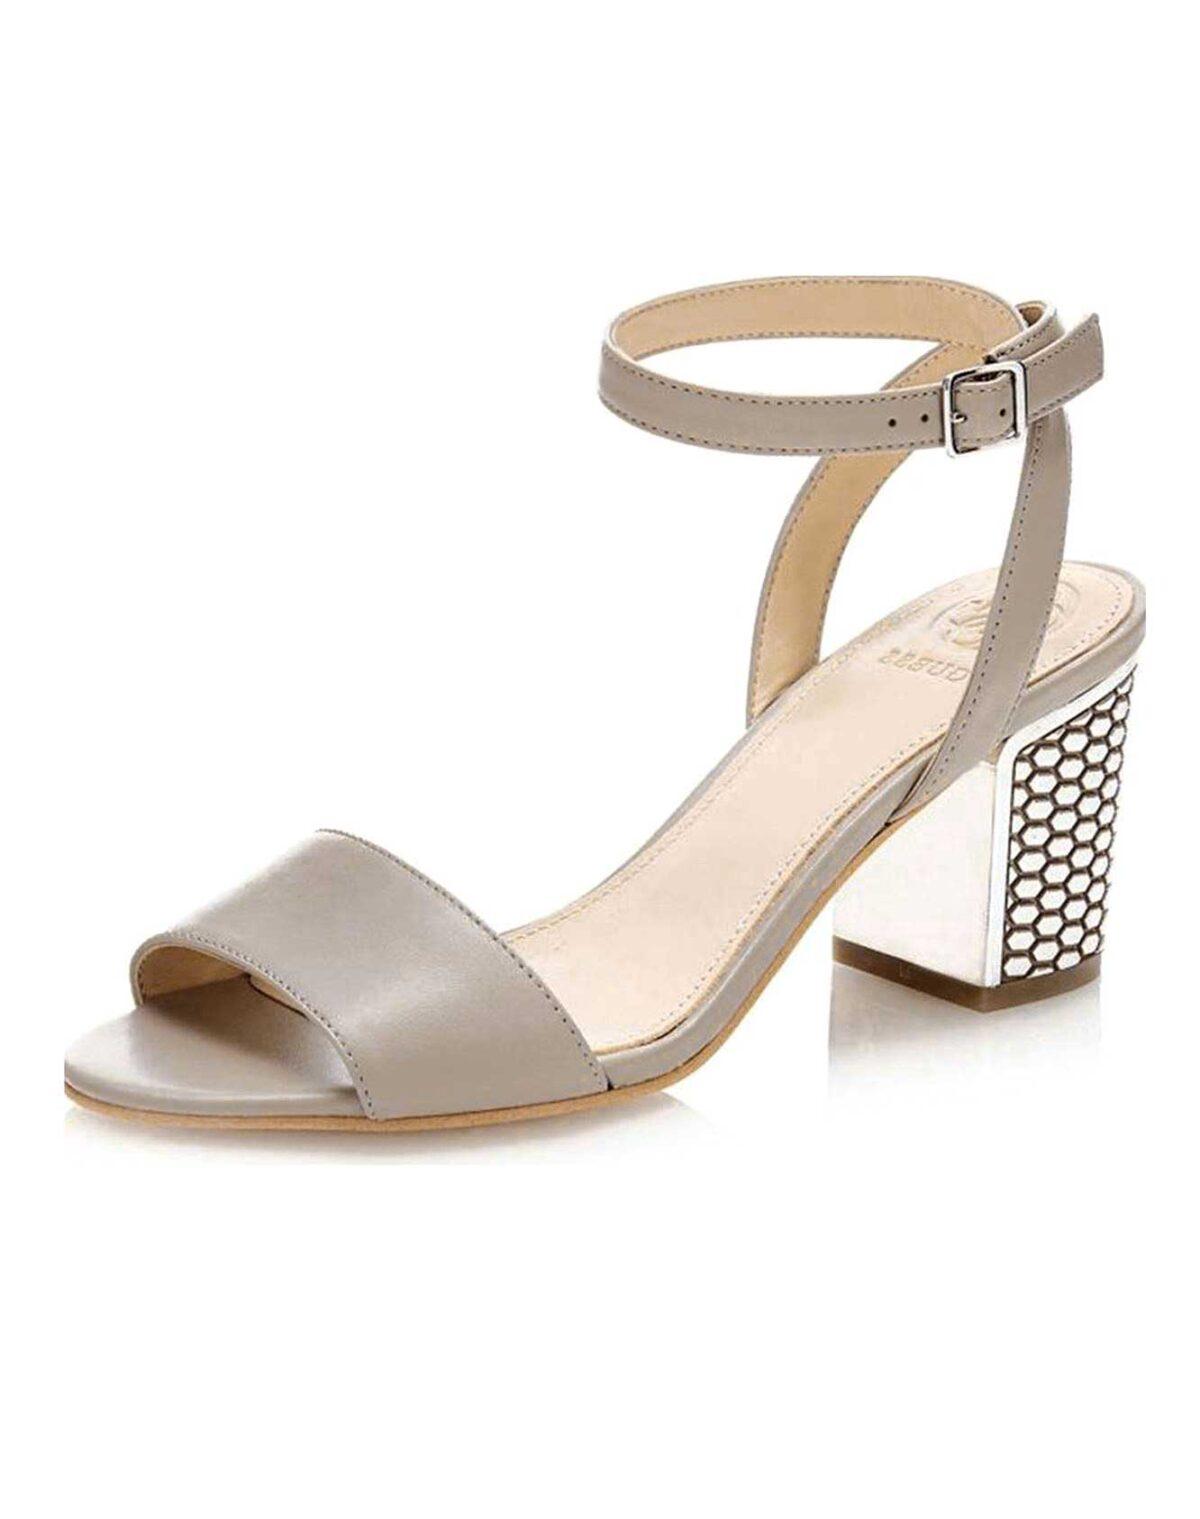 Guess High Heels, taupegrau 179.854 Missforty